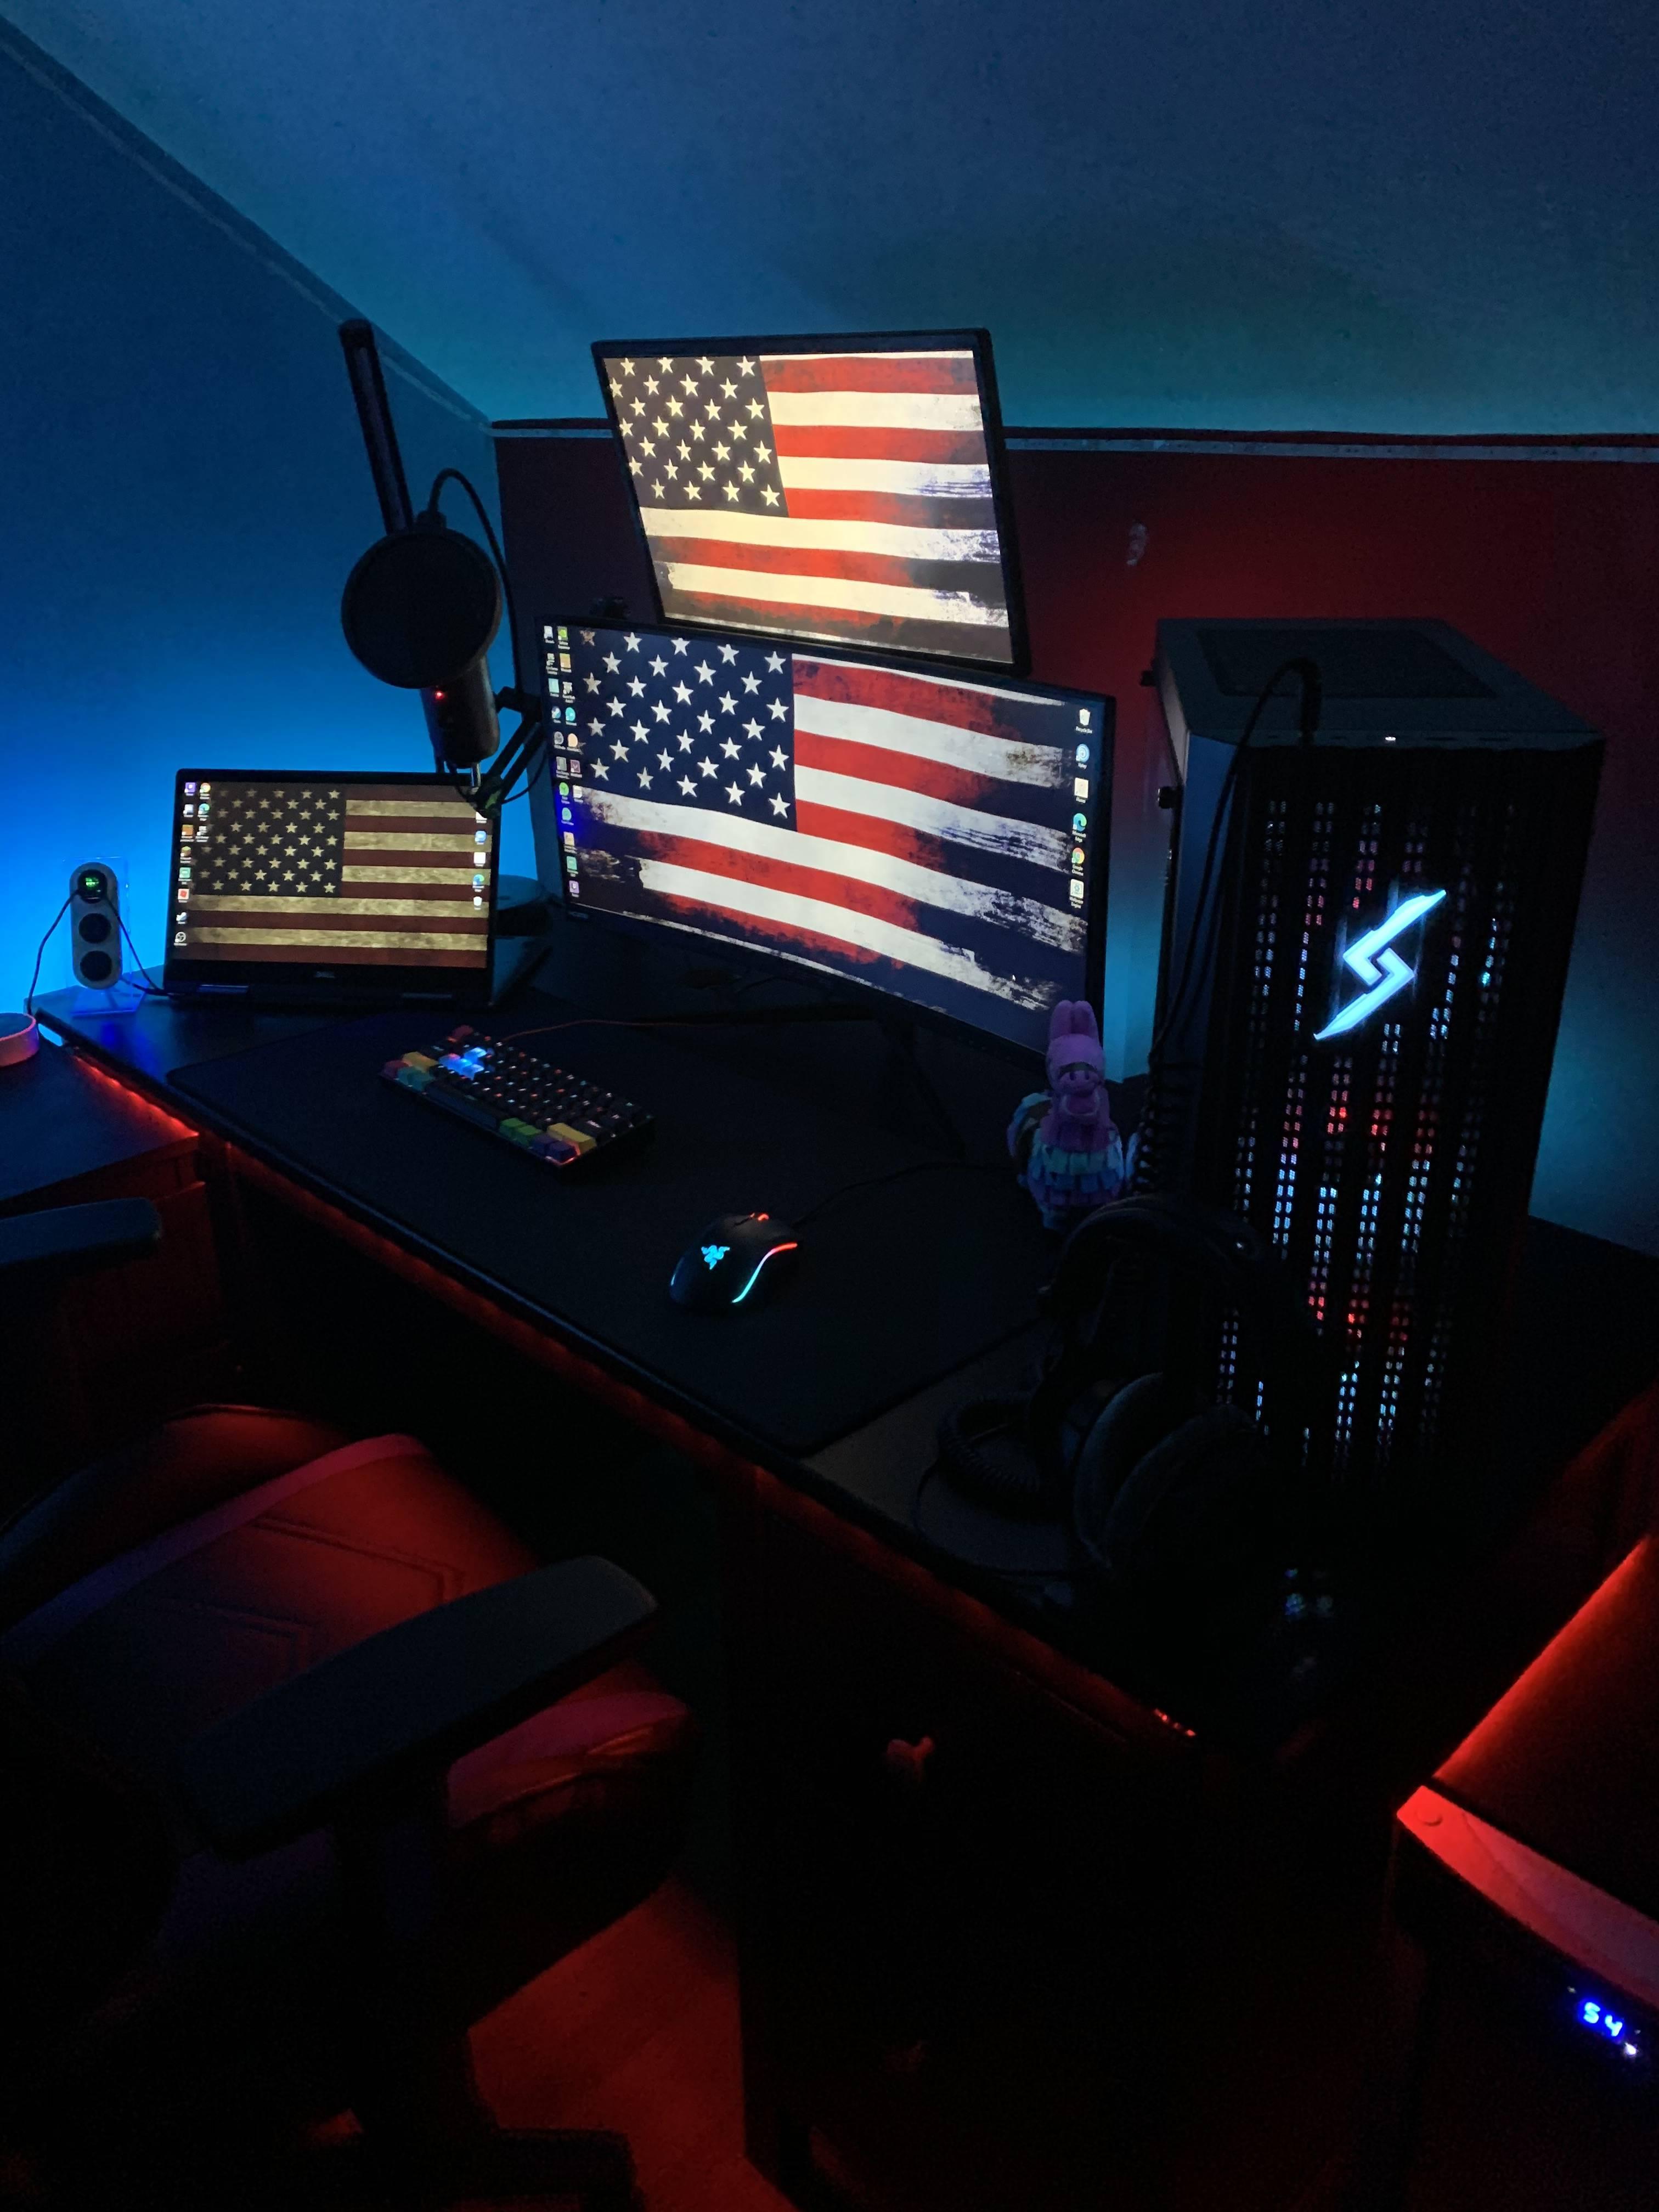 BartoszDec's Setup - My first setup | Scooget